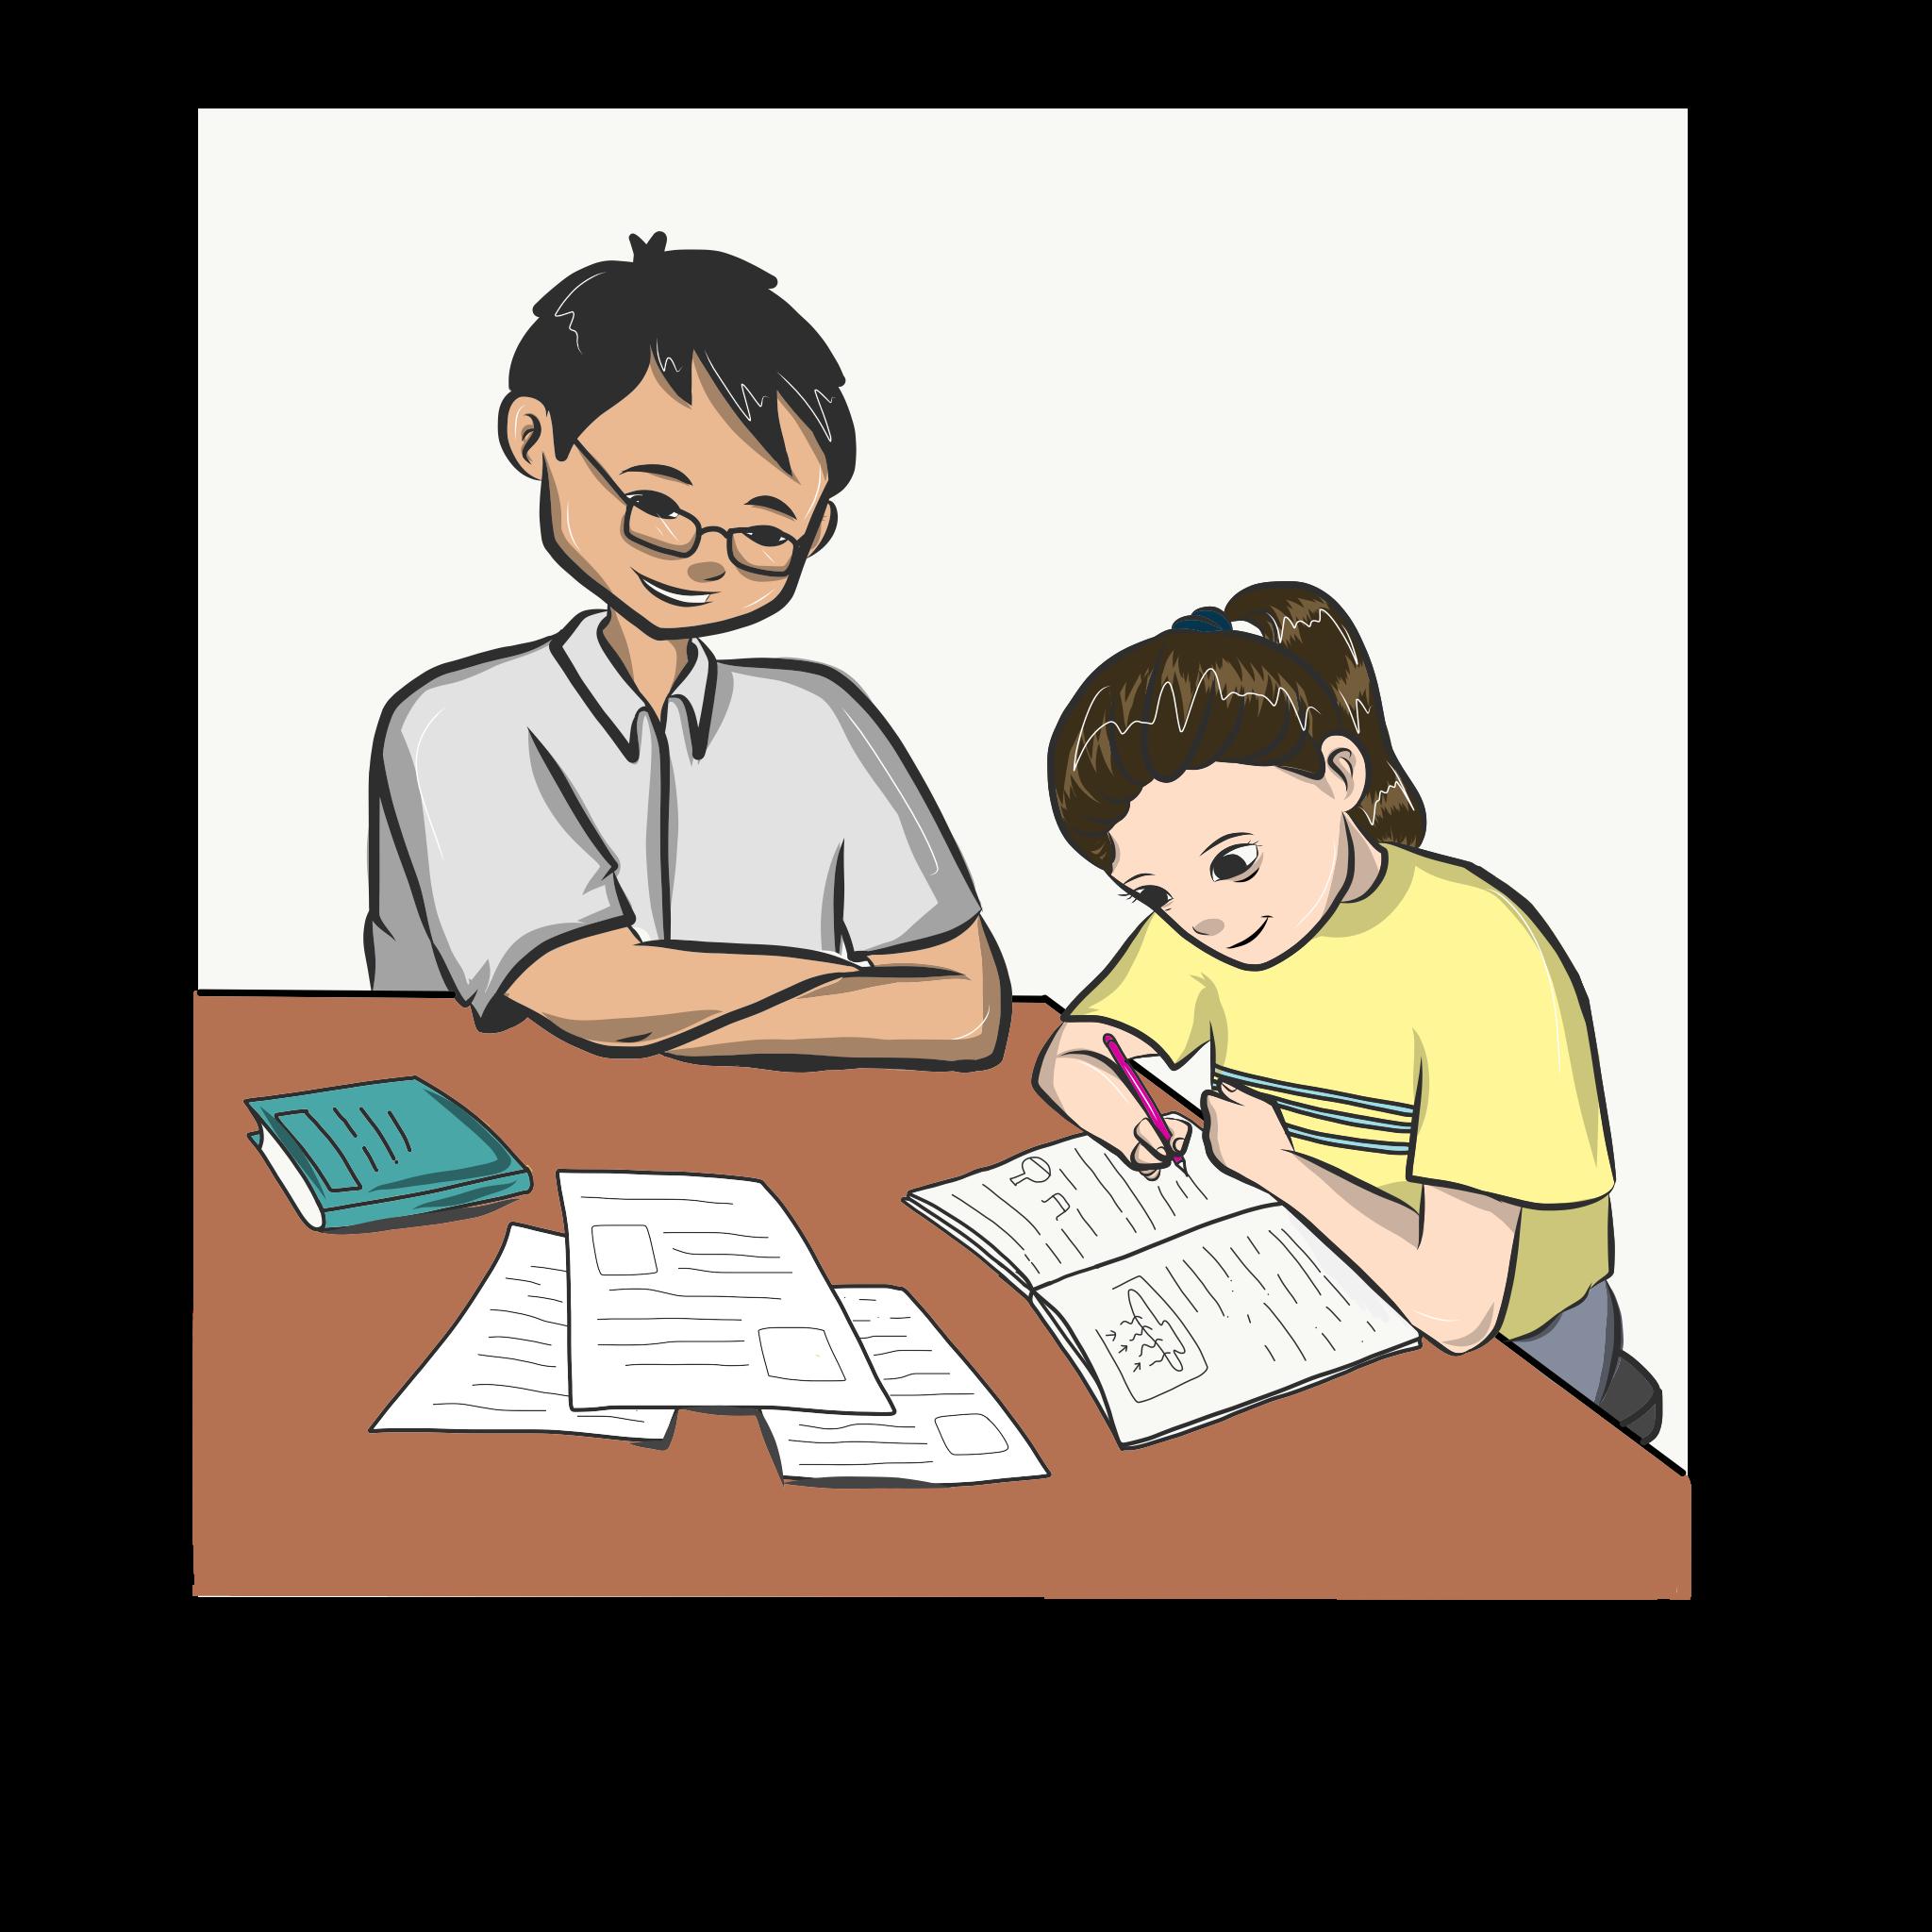 transparent download Tutoring clipart teacher. Mmtutors best service in